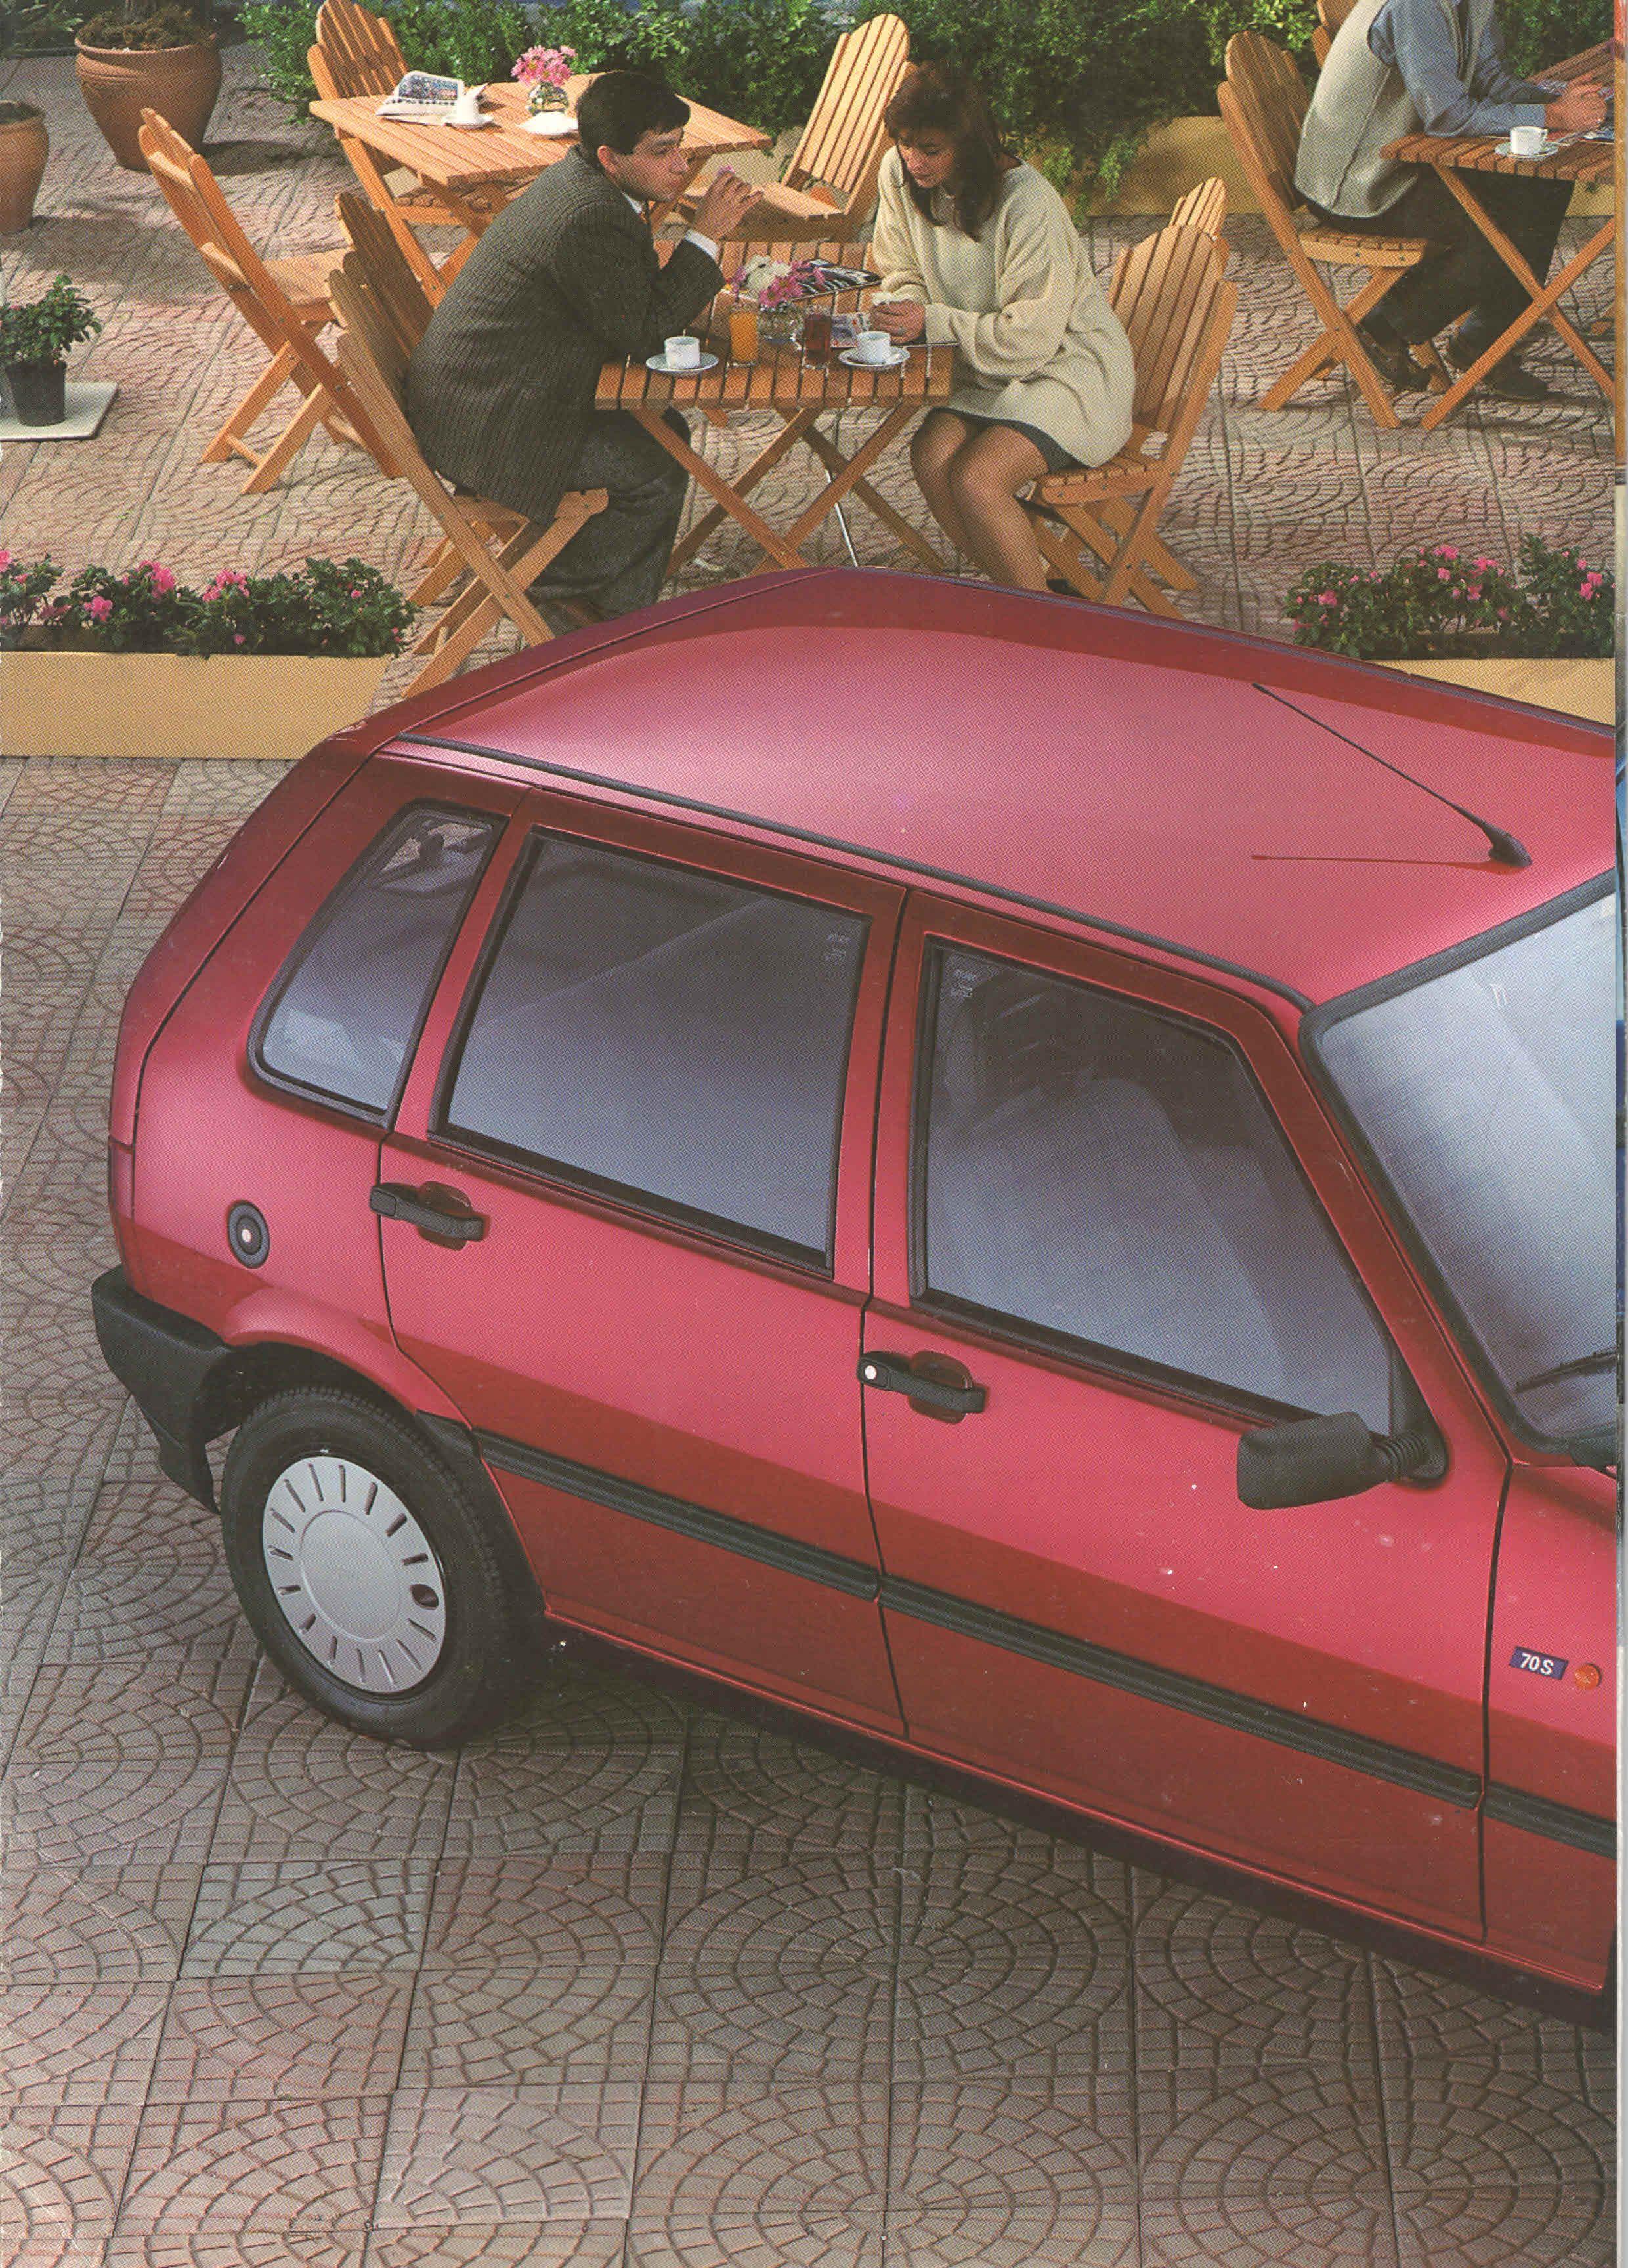 1996 Fiat Uno Turkish Catalog Page 2 8 1996 Fiat Uno Turkce